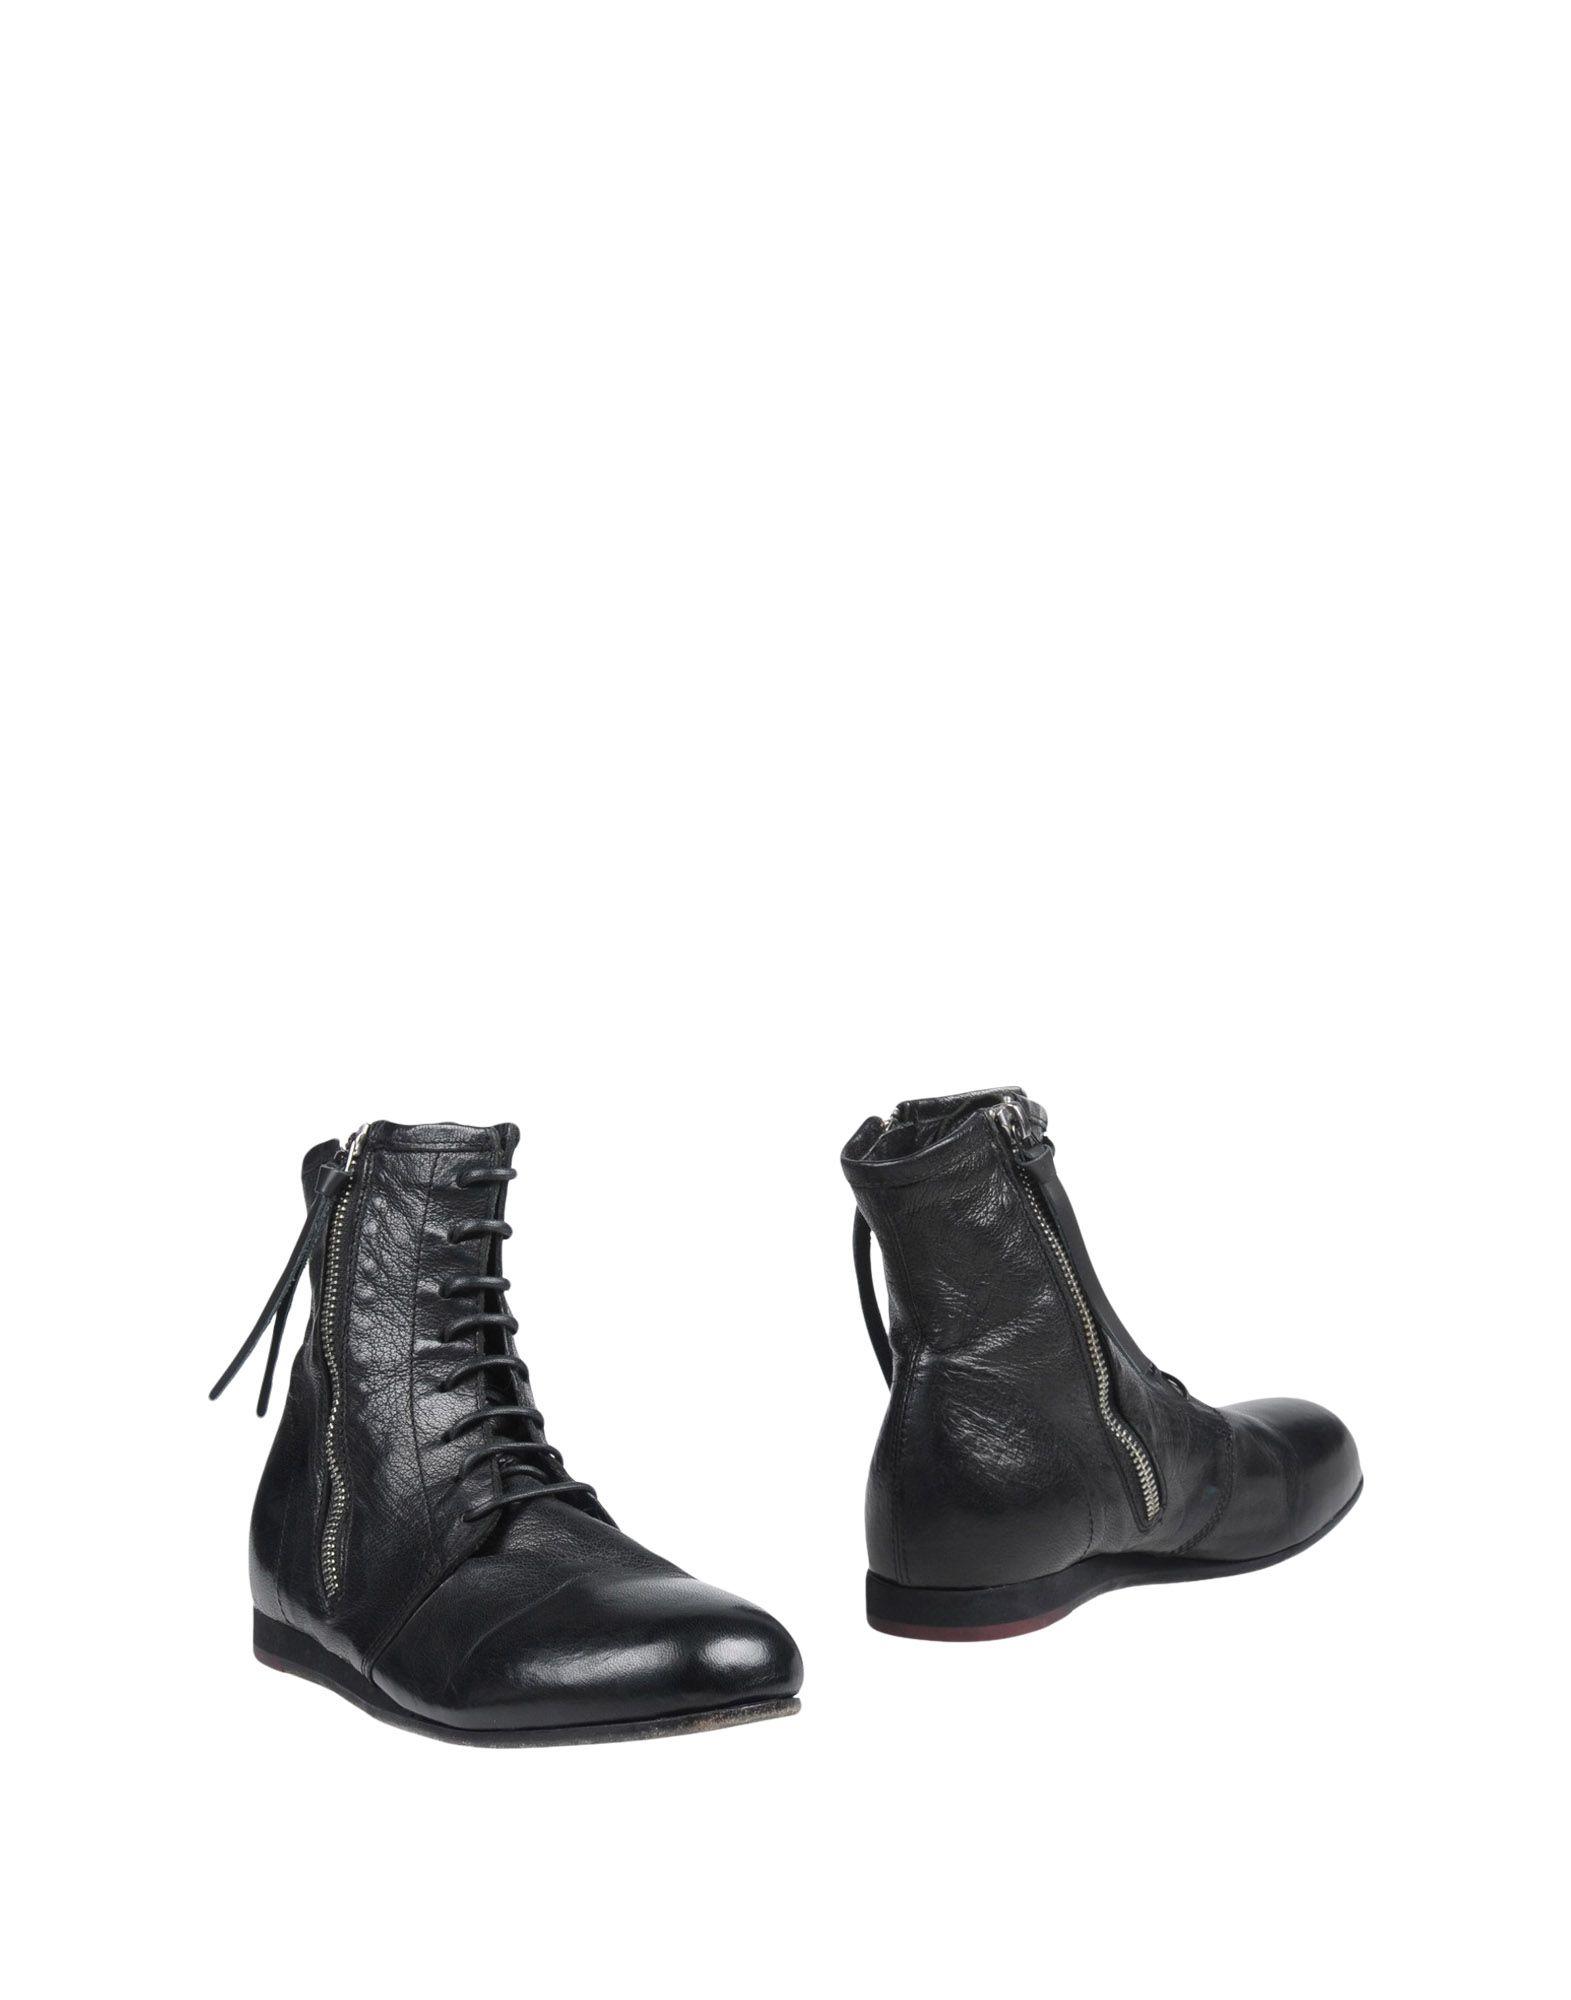 Bruno Bordese Neue Stiefelette Damen  11422126CK Neue Bordese Schuhe ab69c7